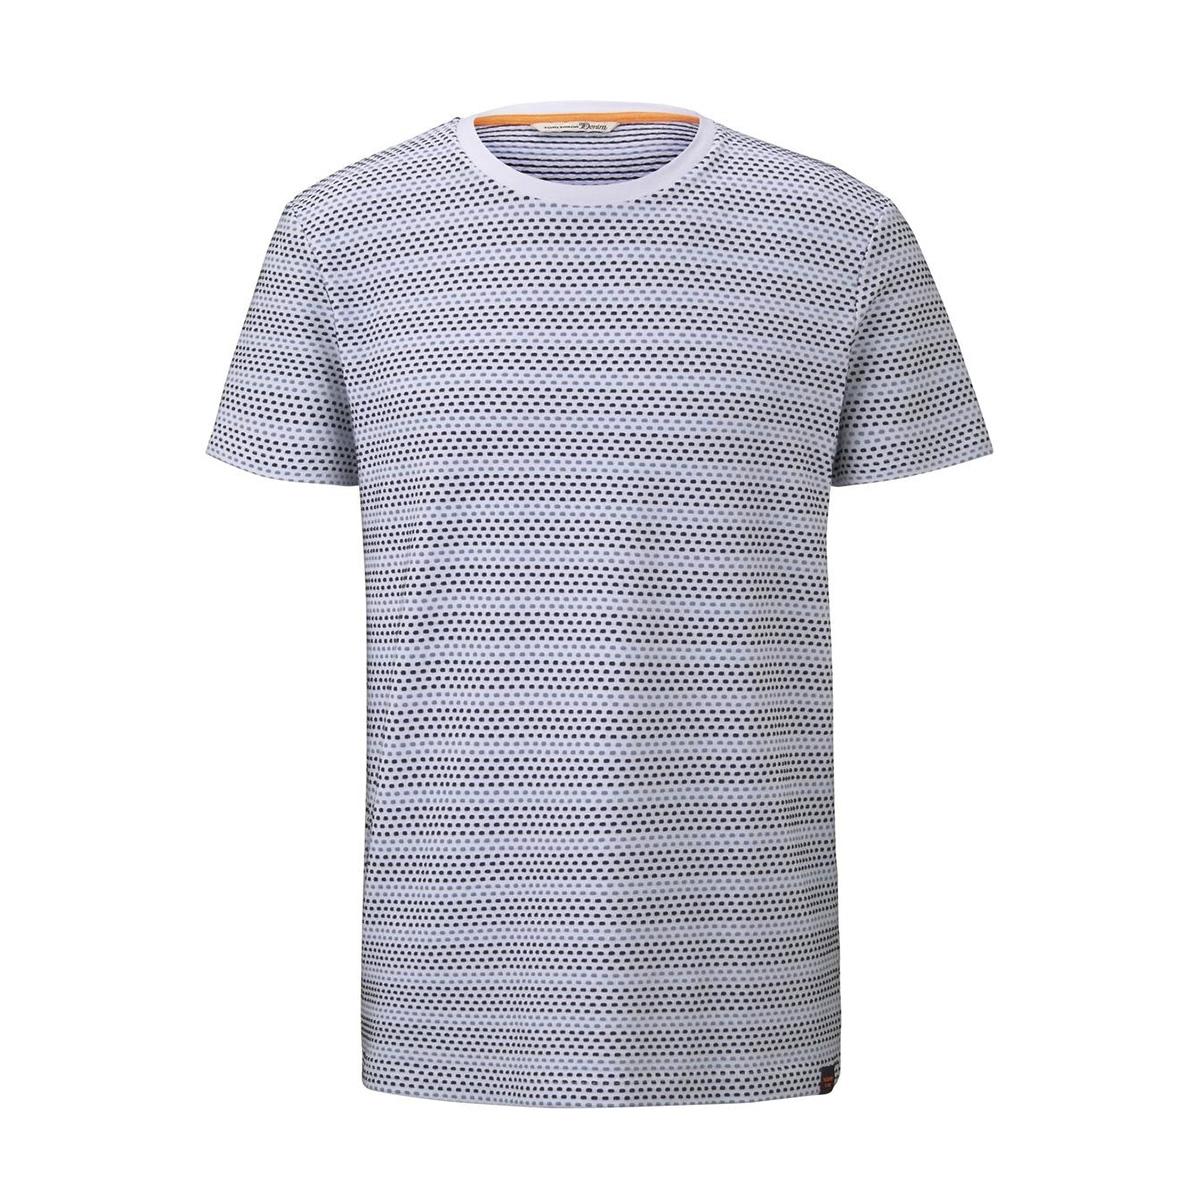 t shirt met patroon 1017292xx12 tom tailor t-shirt 22170